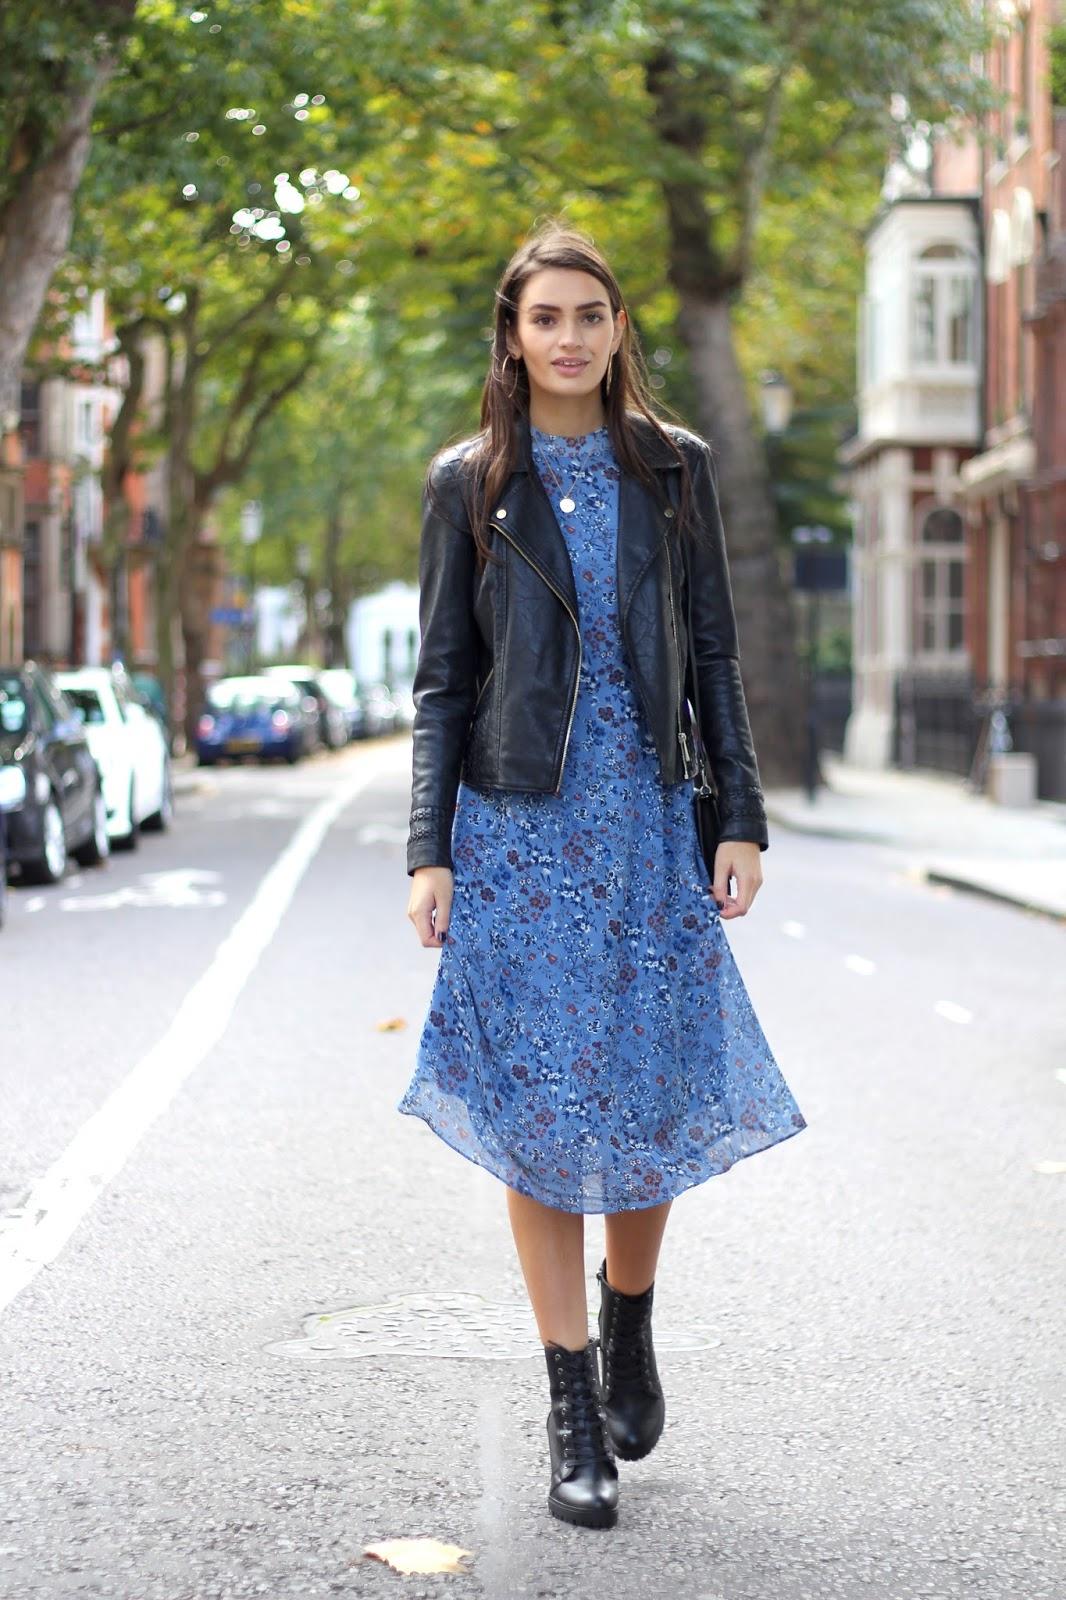 peexo personal style blogger london autumn